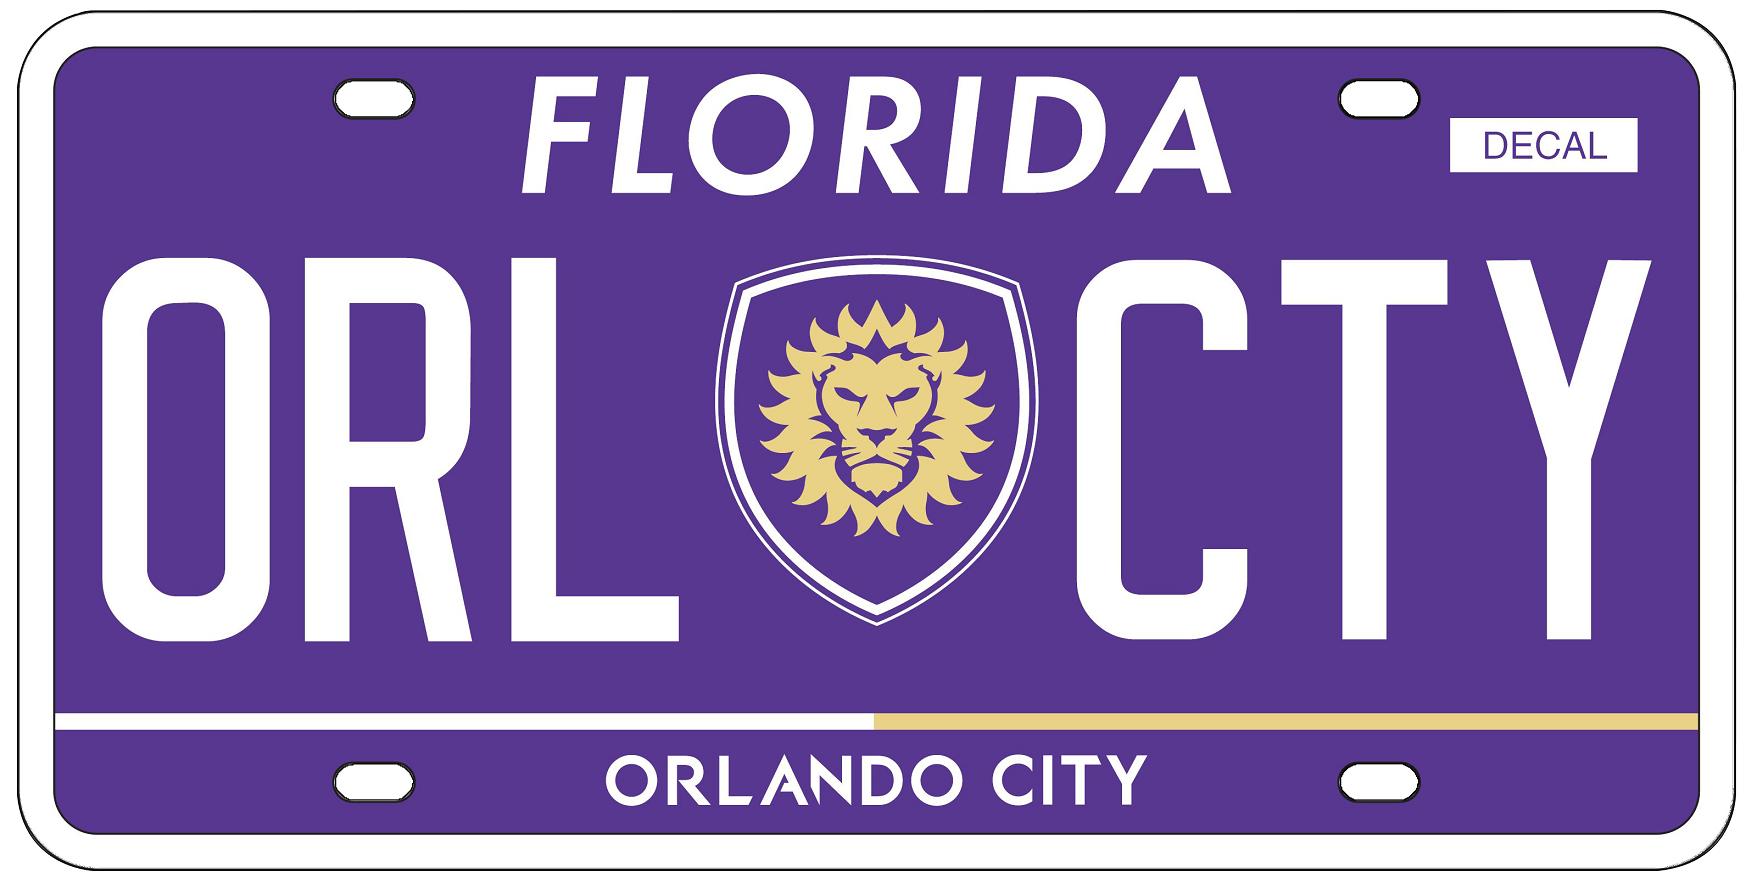 Orlando City Soccer Club Plate